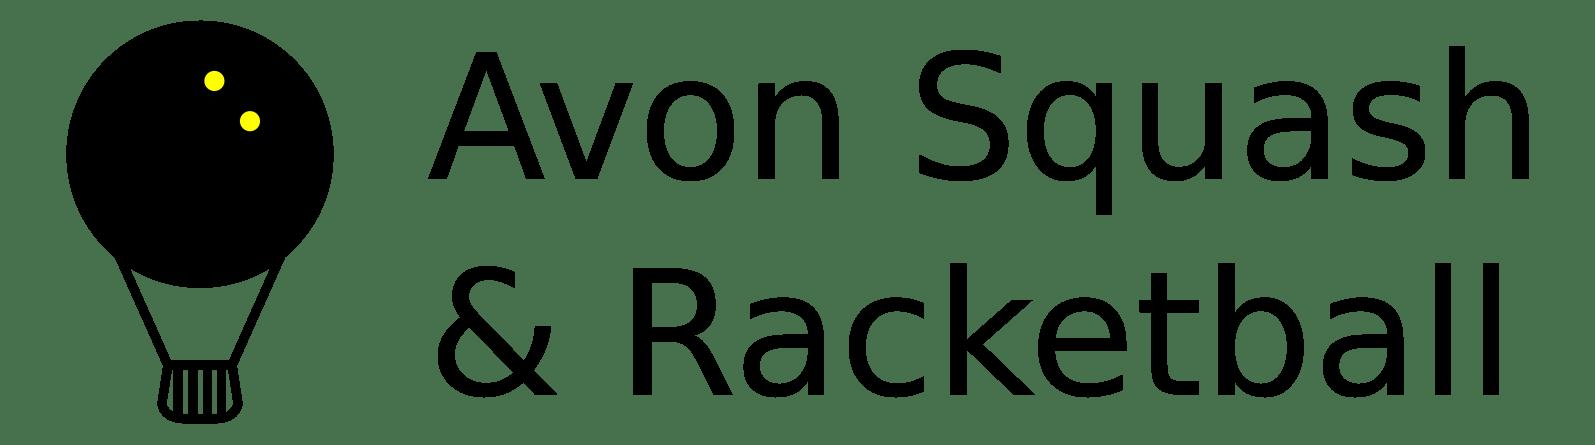 Avon Squash & Racketball